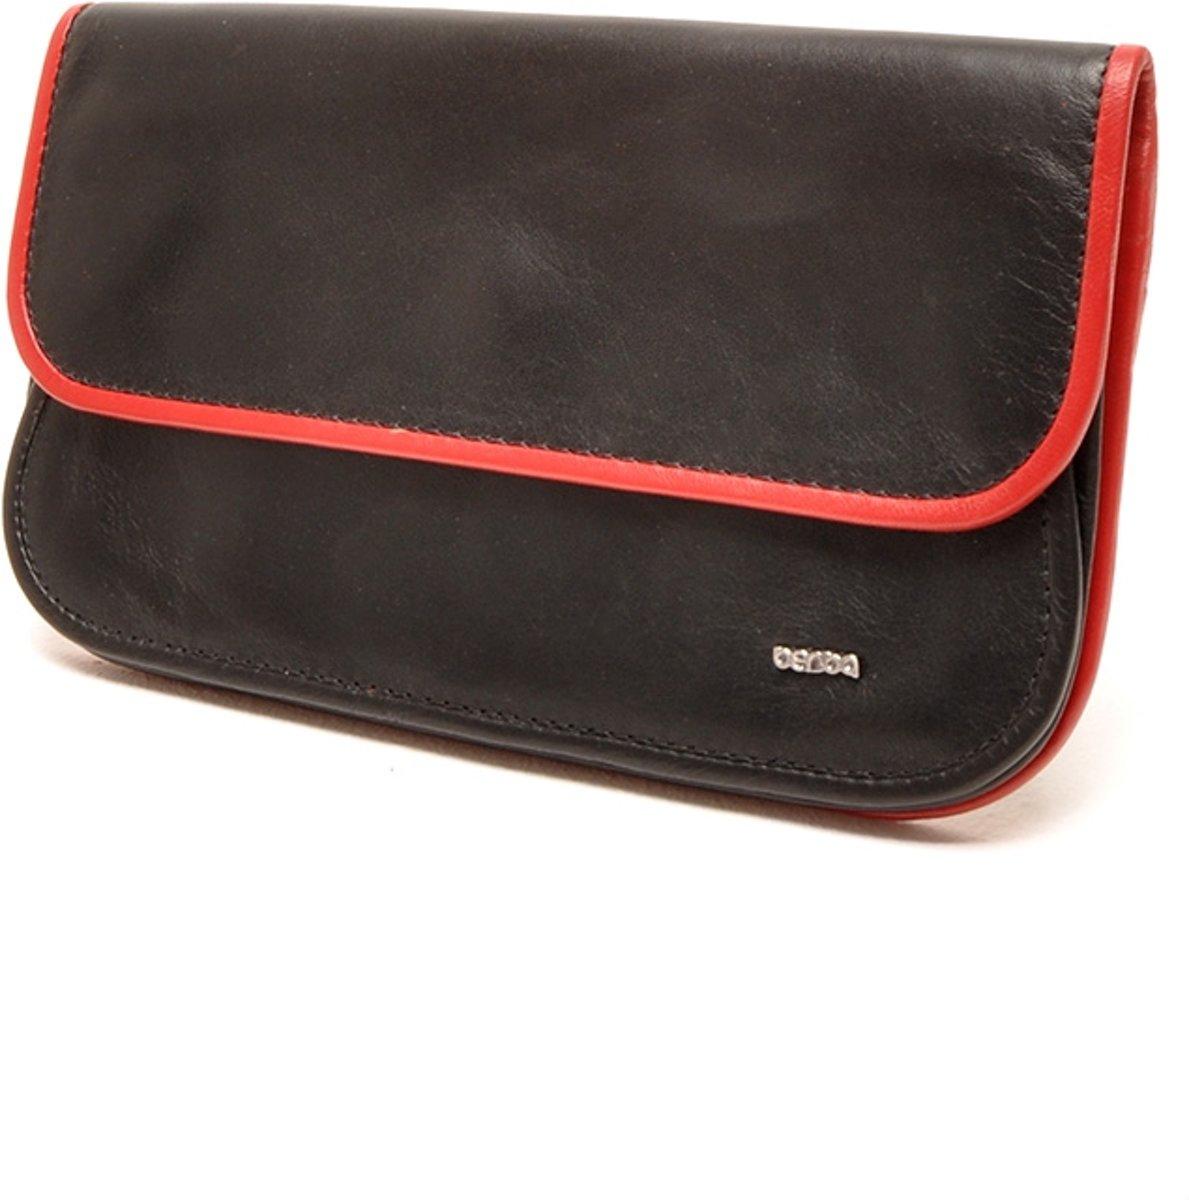 Berba portemonnee Soft 001 164